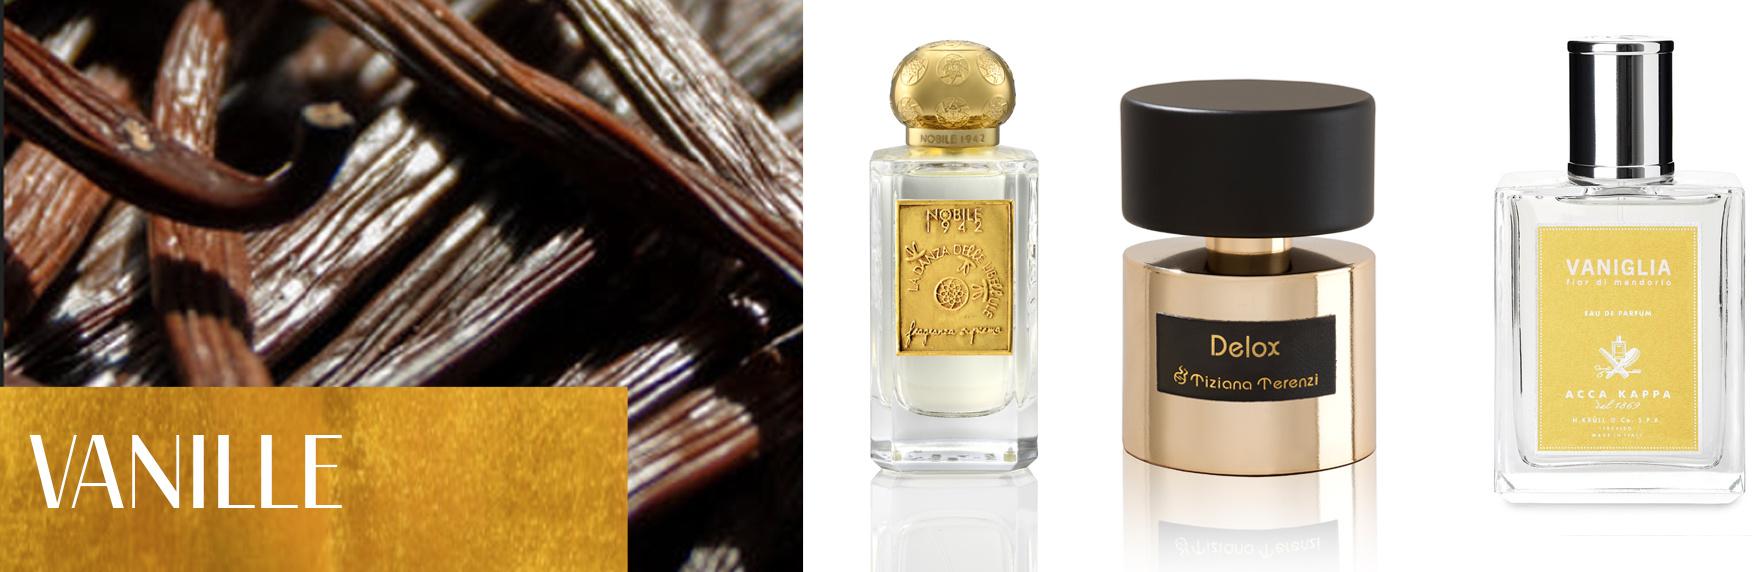 Perfume Ingredients: Vanilla